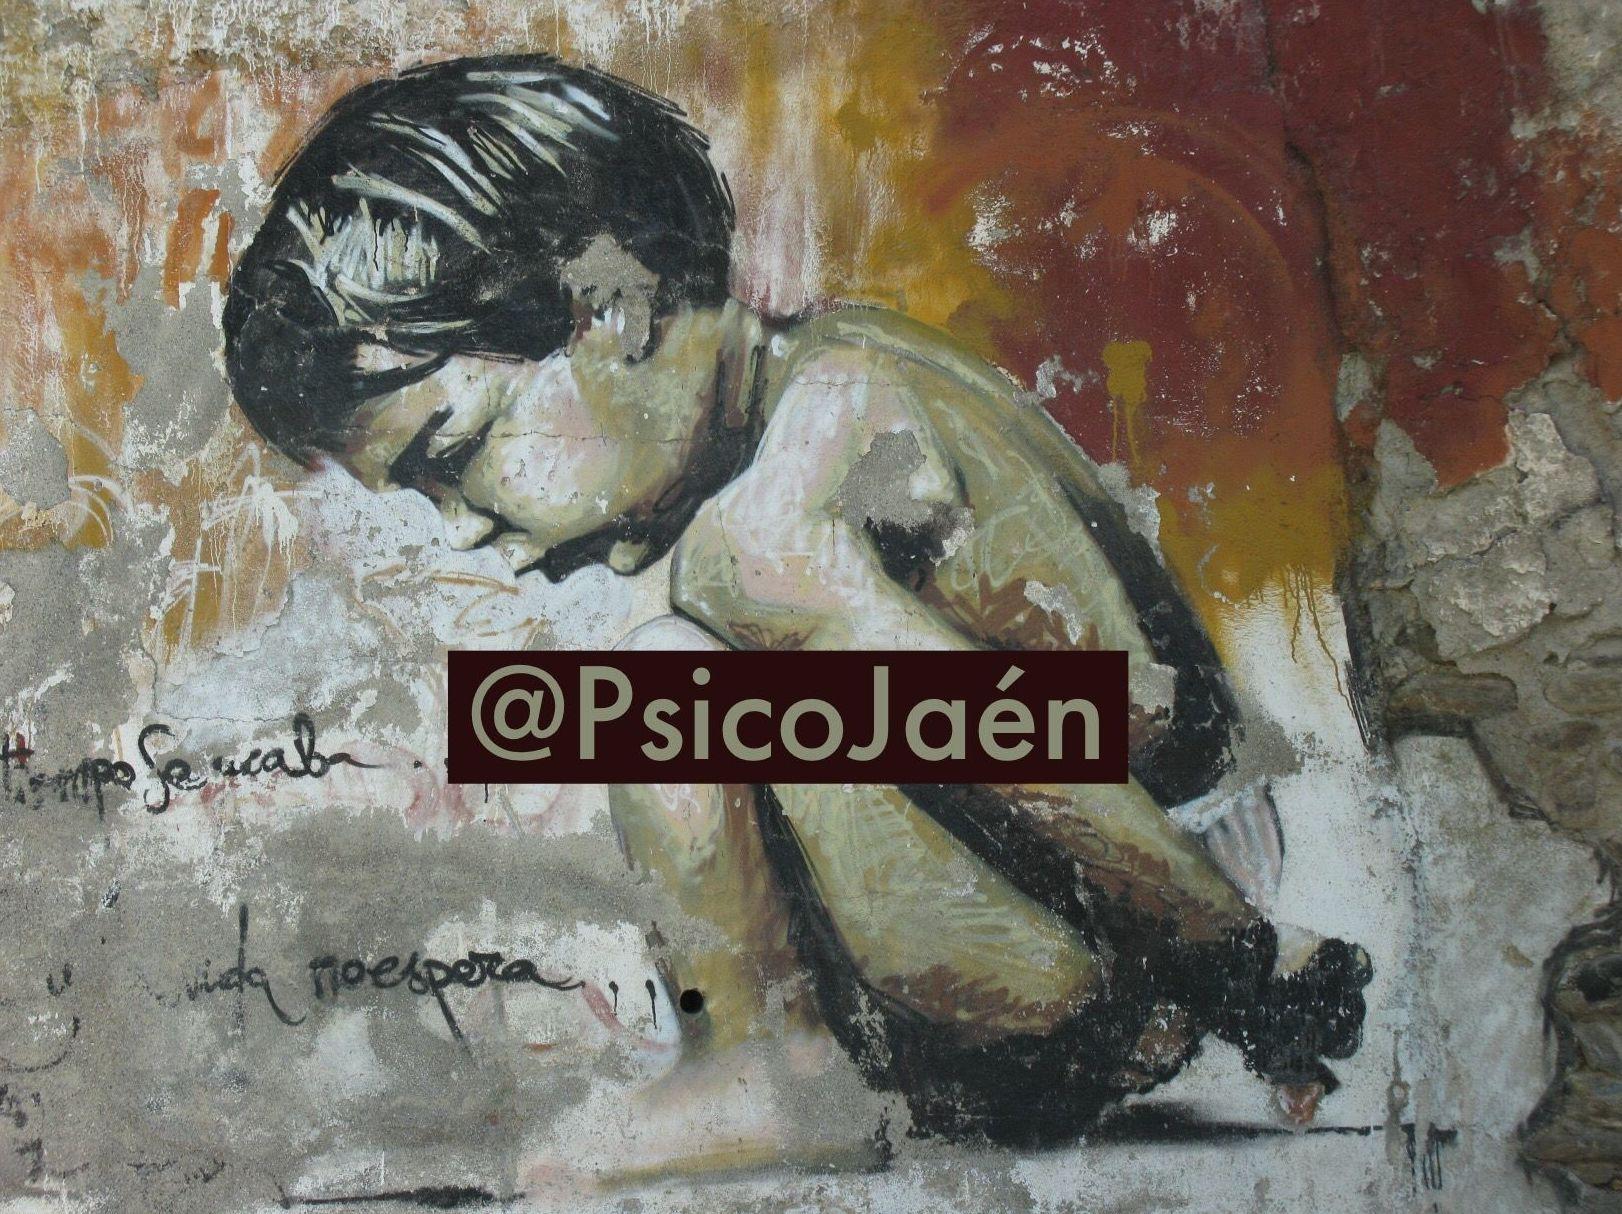 Violencia sutil: tan destructiva como un gran trauma